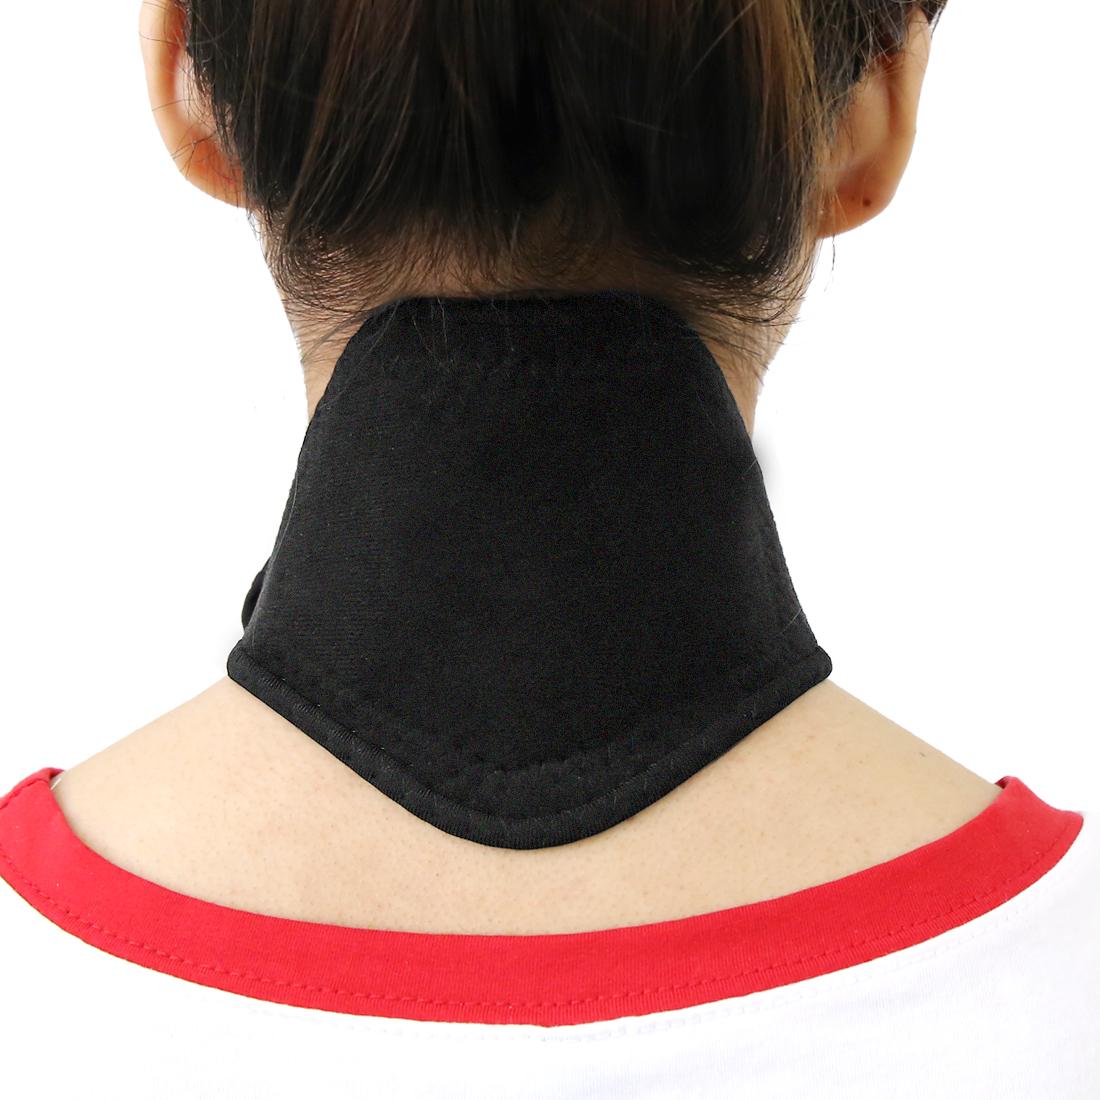 Black Unisex Magnet Massage Neck Pad Wrap Brace Support Strap Protector